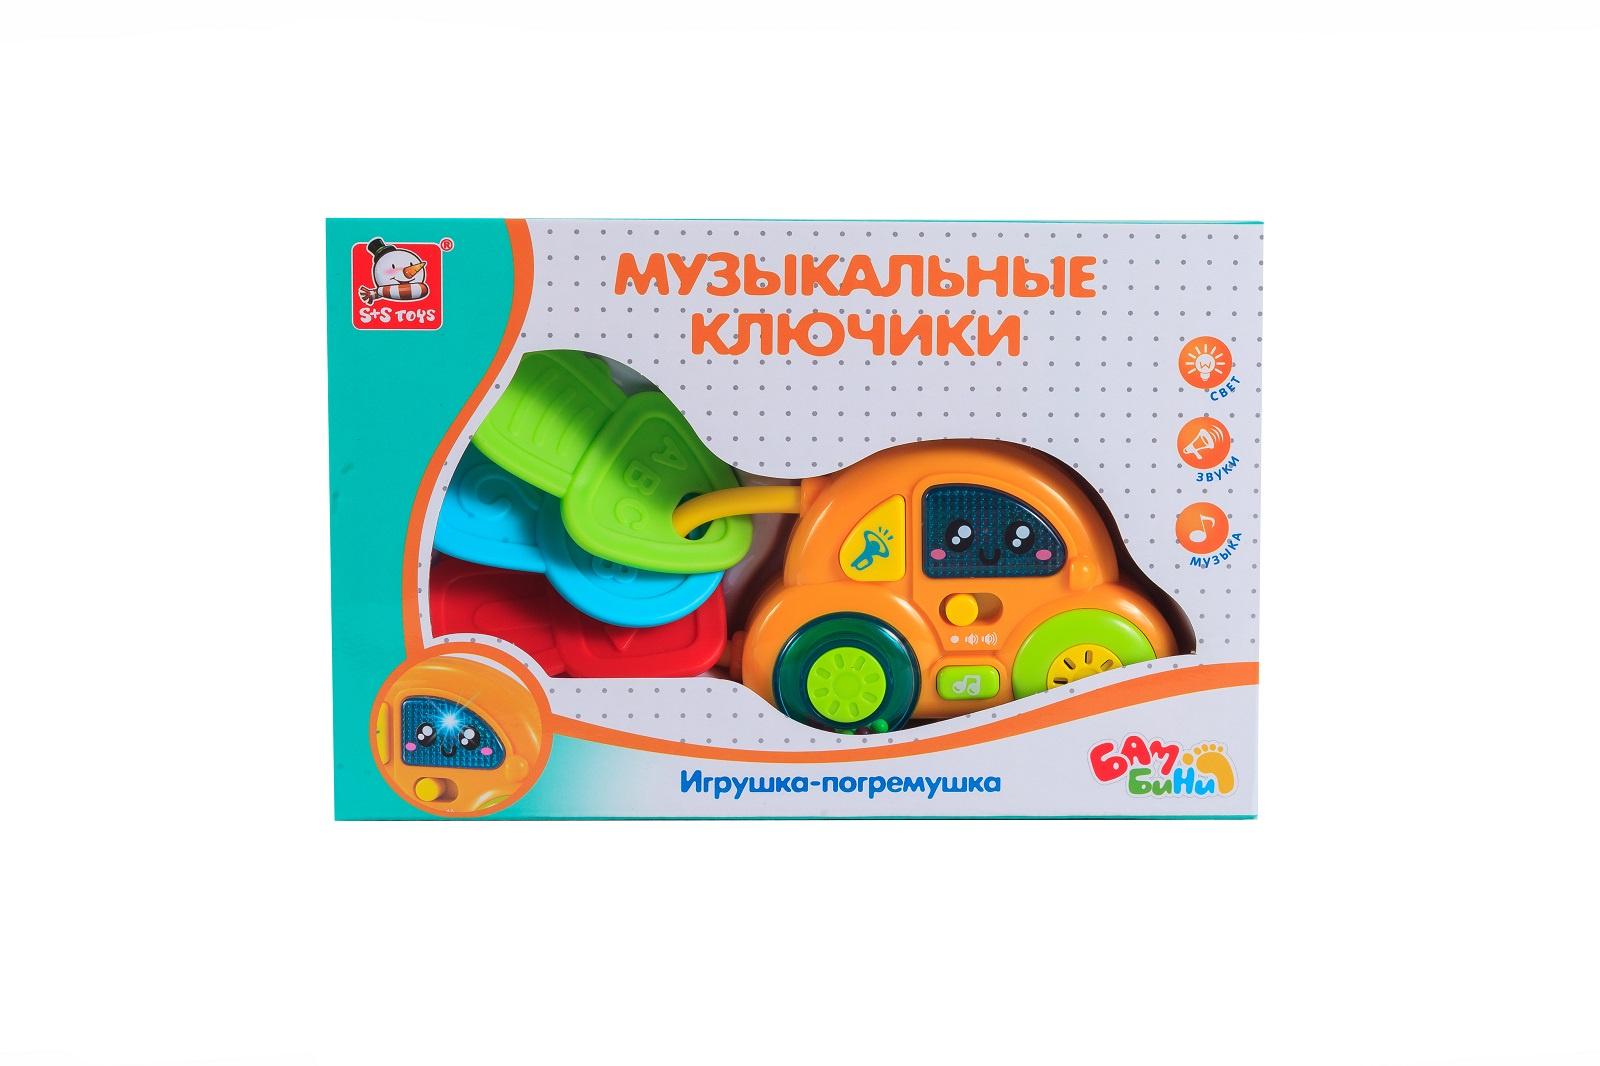 Развивающая игрушка S+S,  Ключики Бамбини, 200061412 s s toys 00662603 пианино бамбини